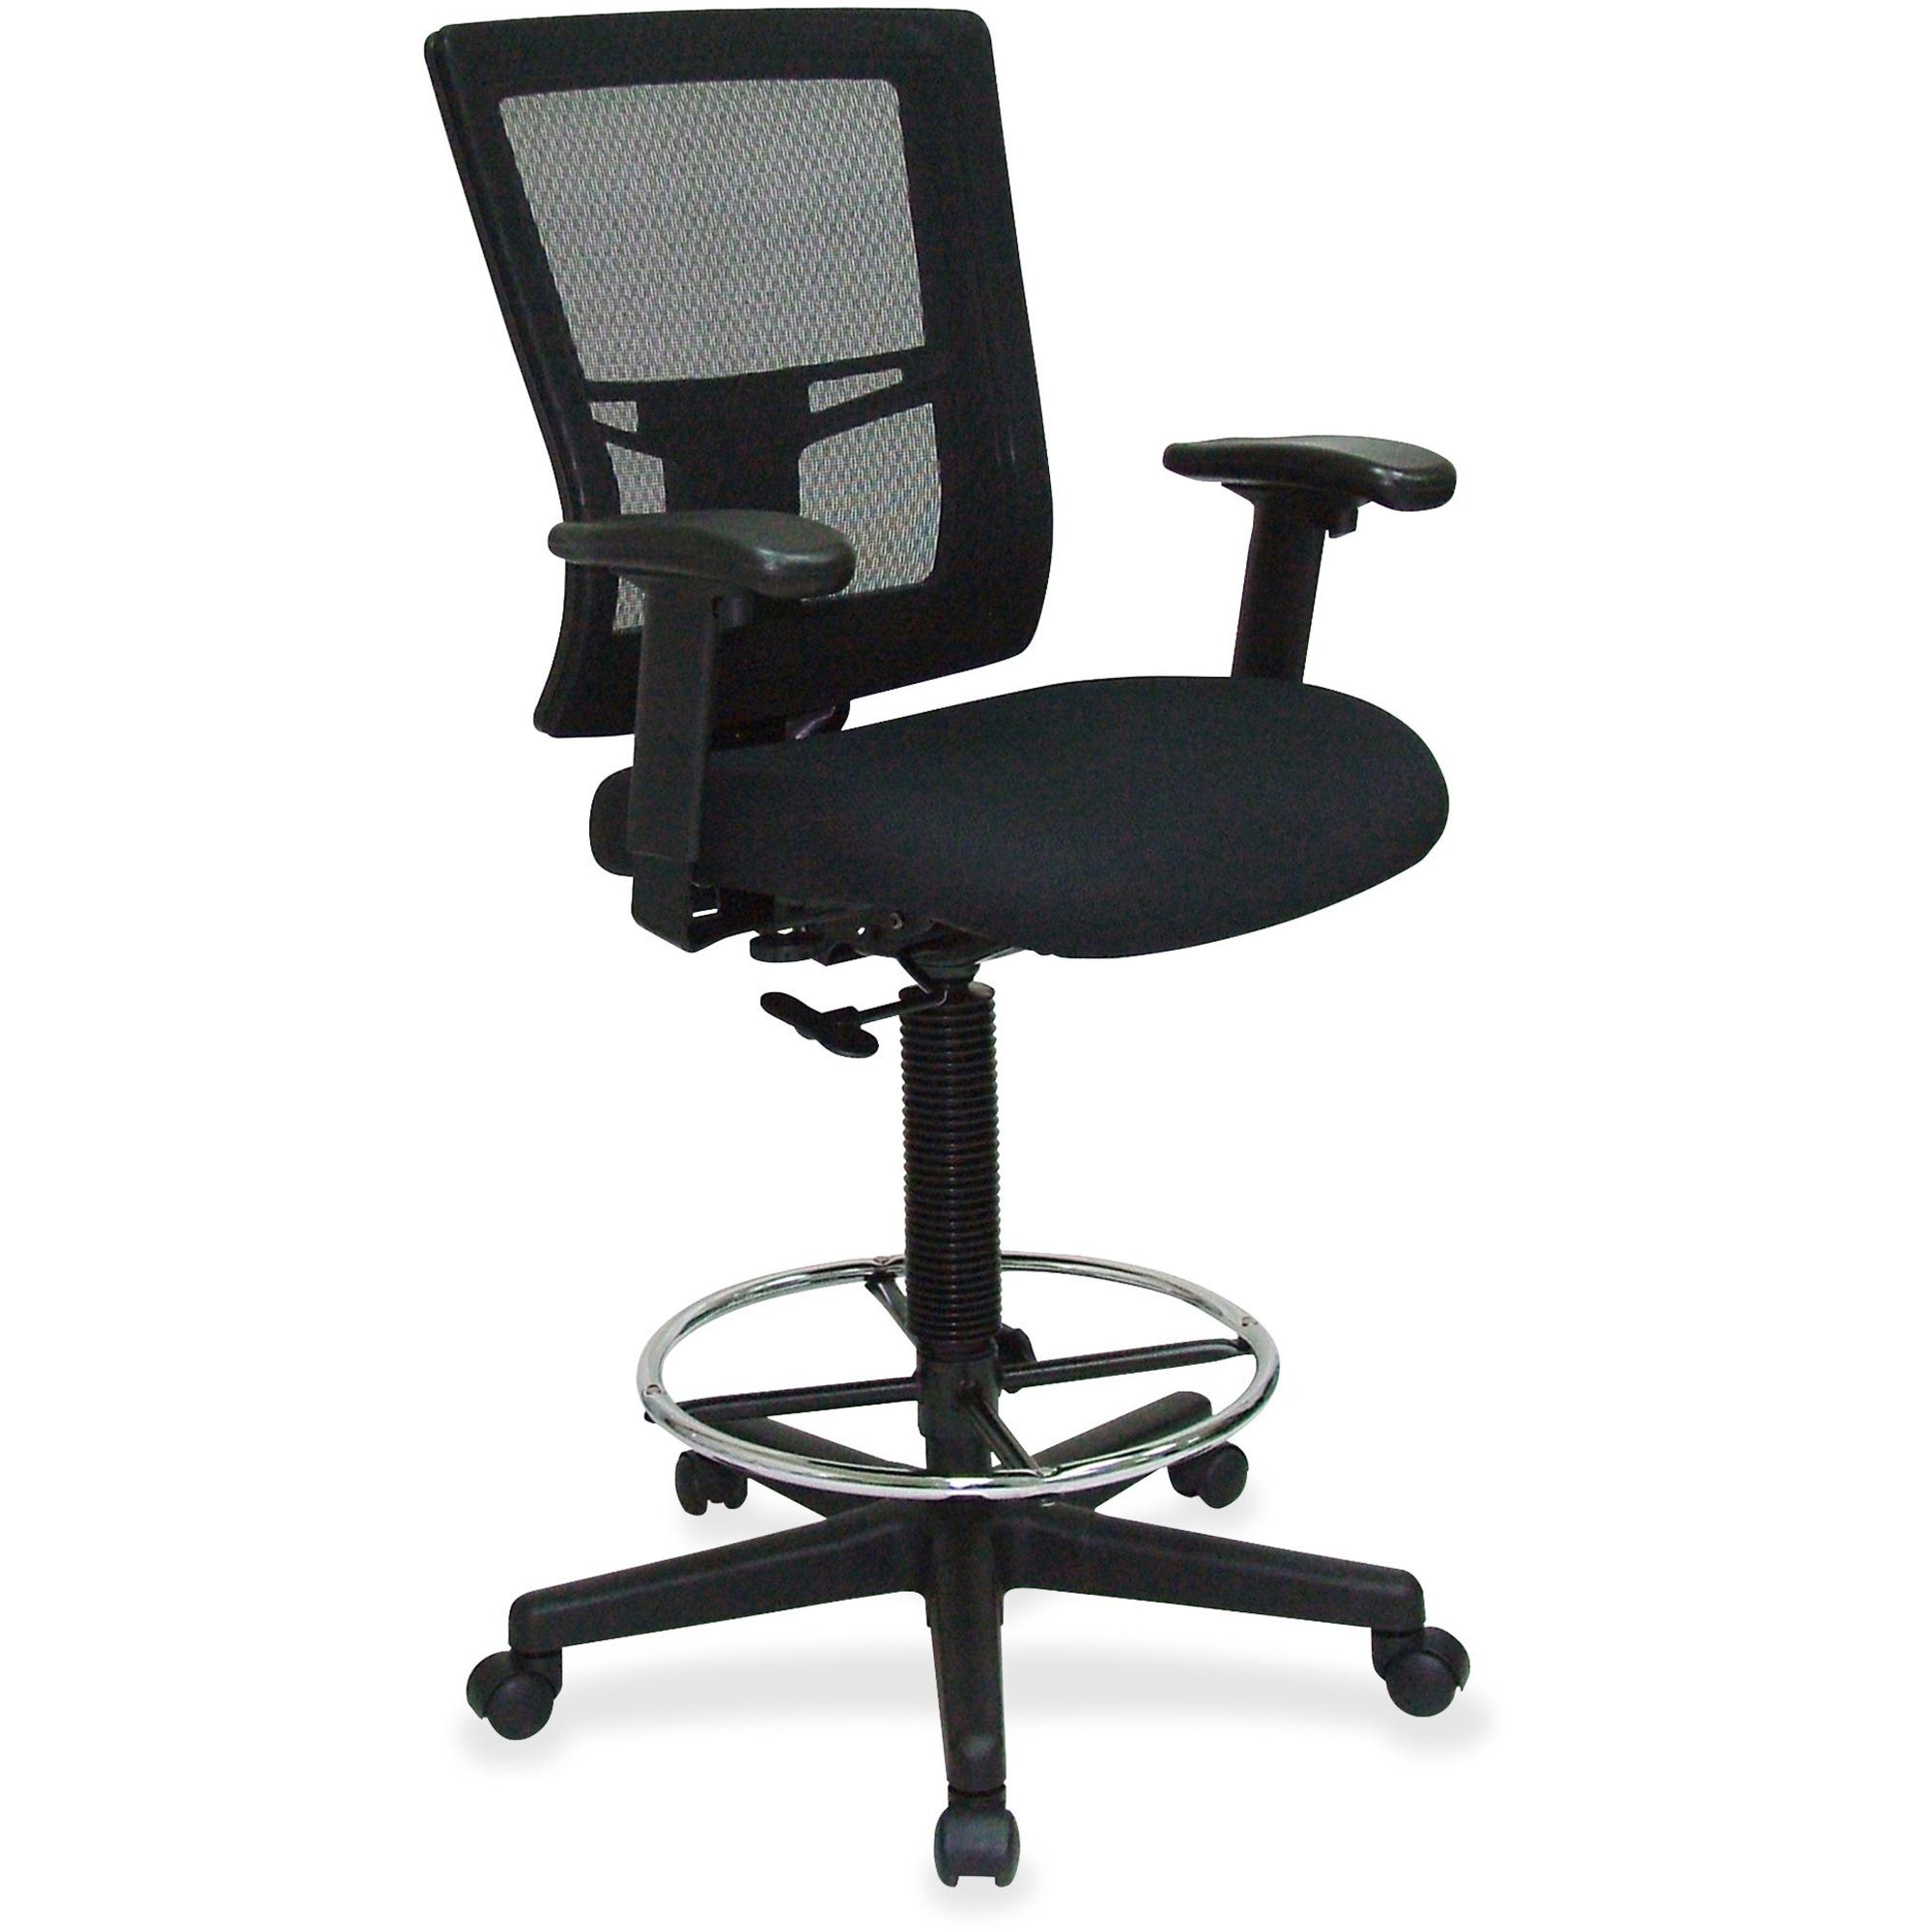 Lorell Breathable Mesh Drafting Stool Black Seat 5